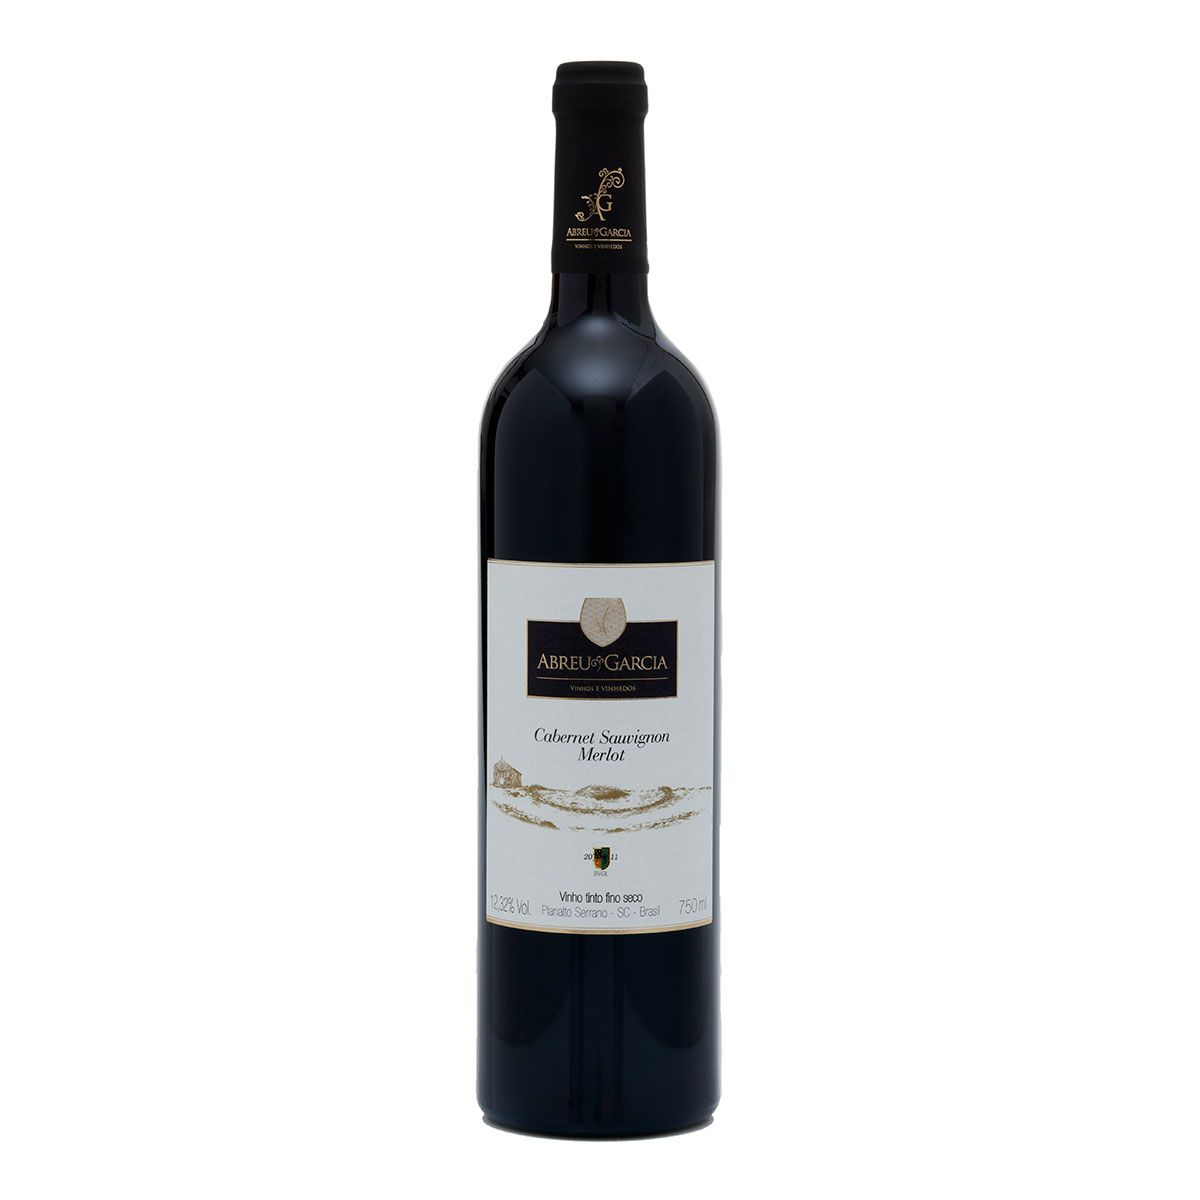 Vinho Fino Tinto Seco Abreu Garcia Cabernet Sauvignon/Merlot 2012 750ml